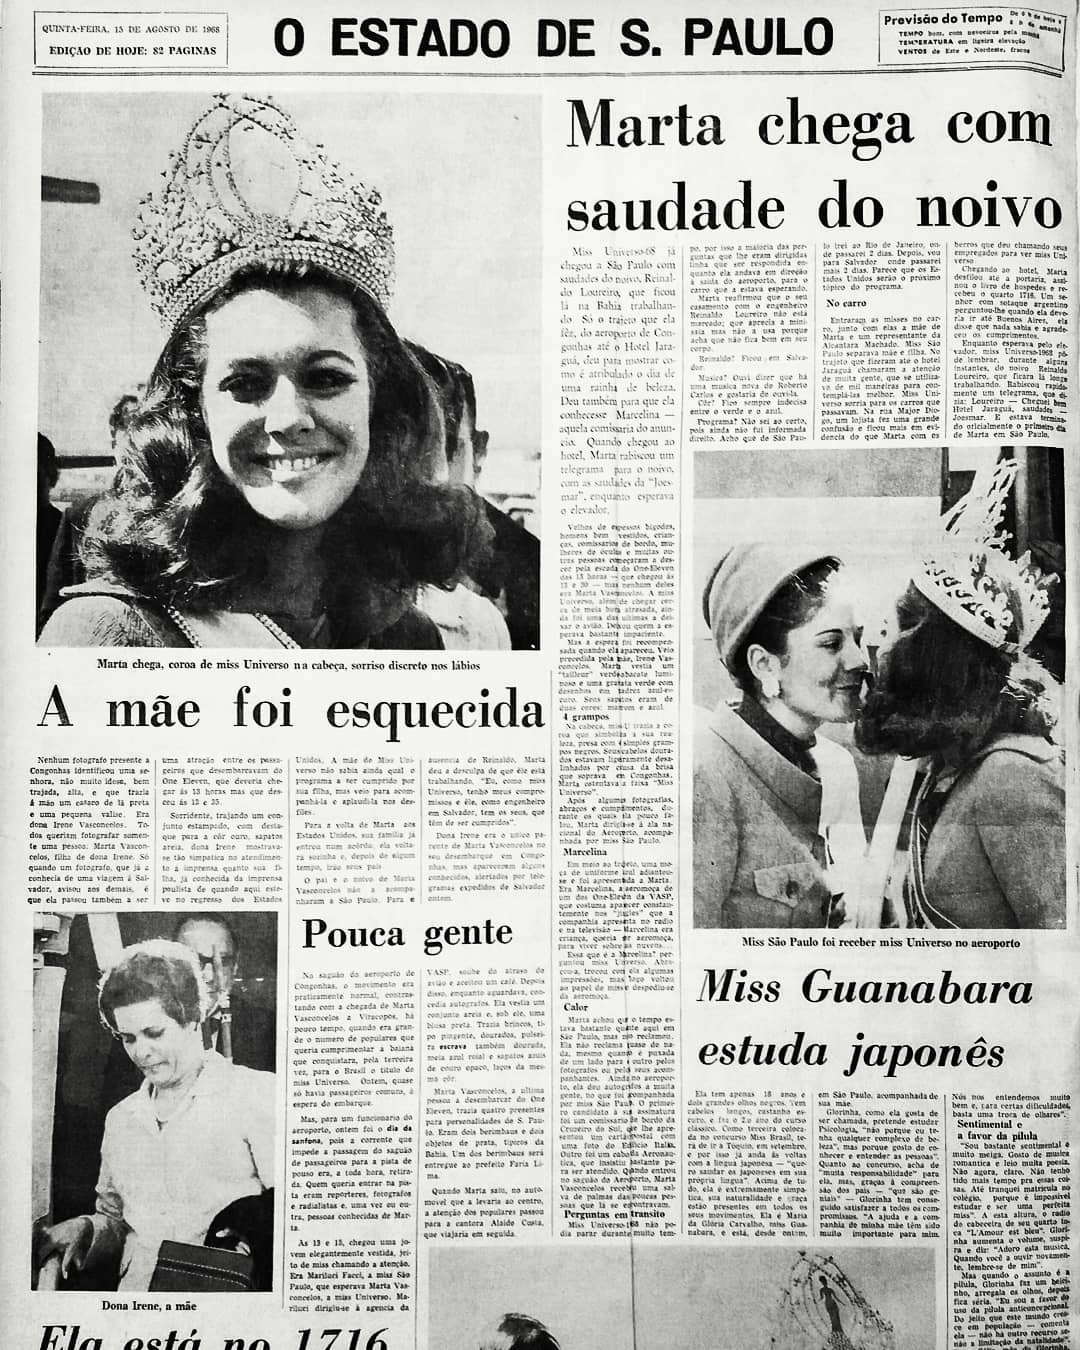 ☽ ✮ ✯ ✰ ☆ ☁ Galeria de Martha Vasconcelos, Miss Universe 1968.☽ ✮ ✯ ✰ ☆ ☁ - Página 3 38850510